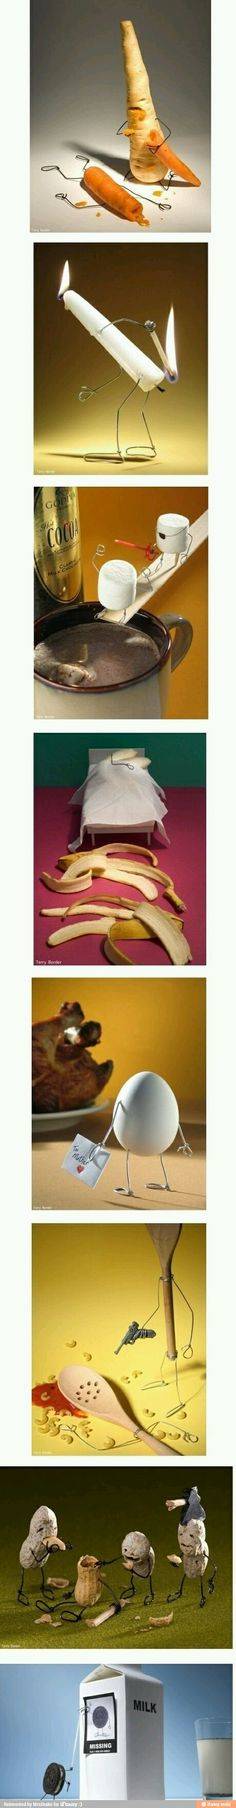 Foods gone wild